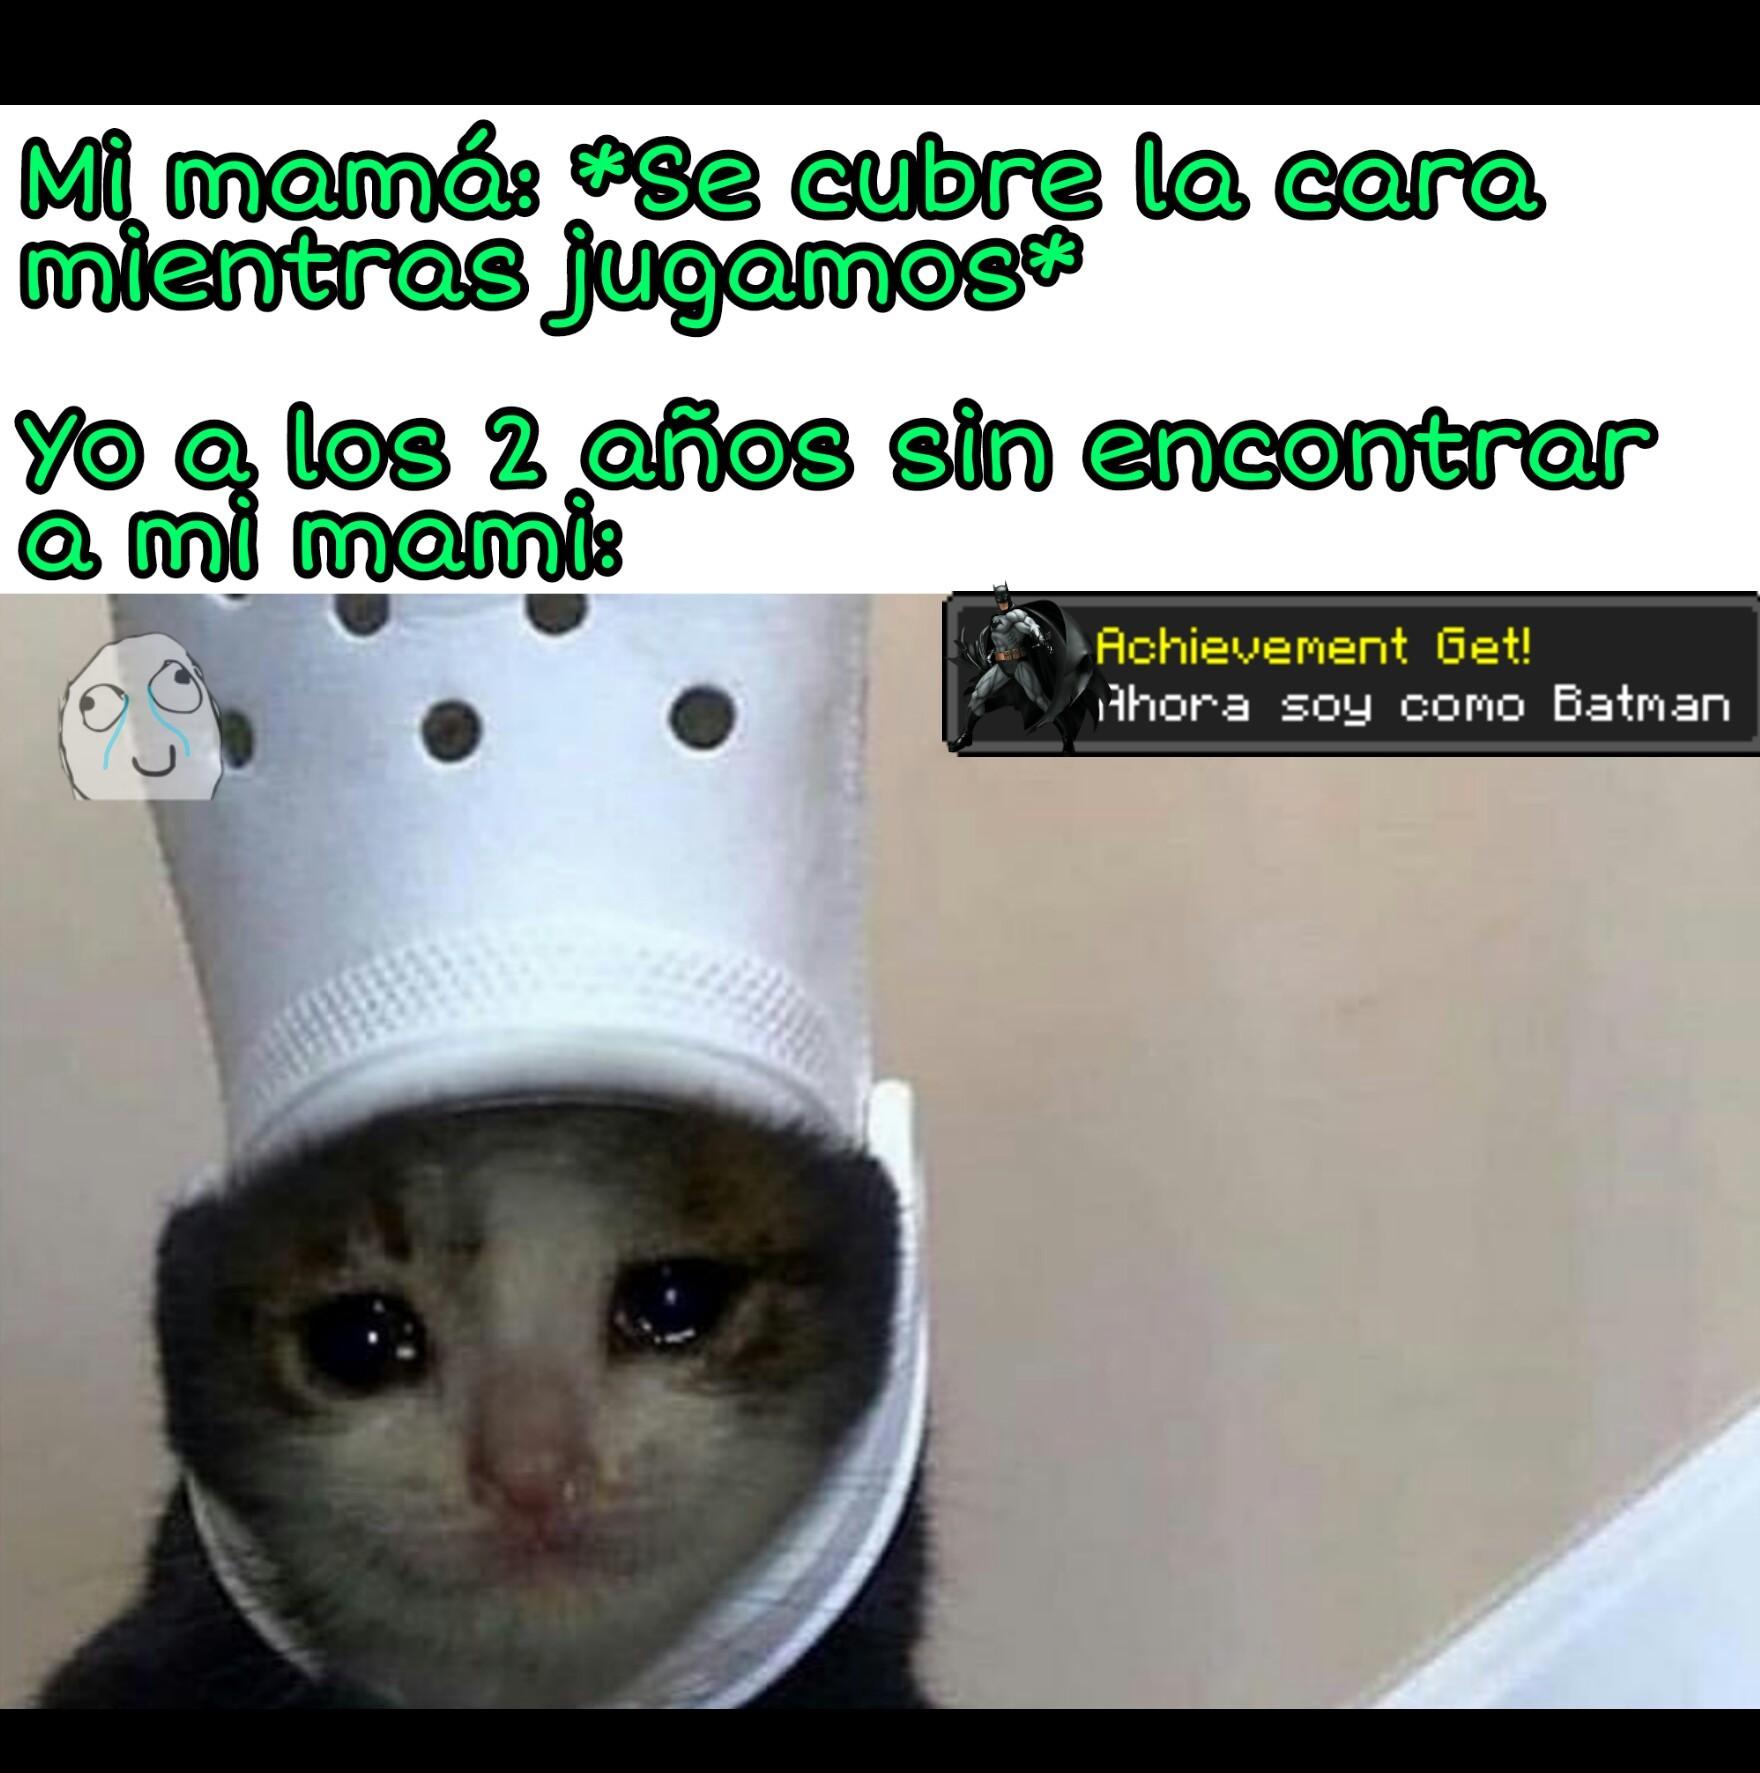 MAMI NOOOOOOO - meme